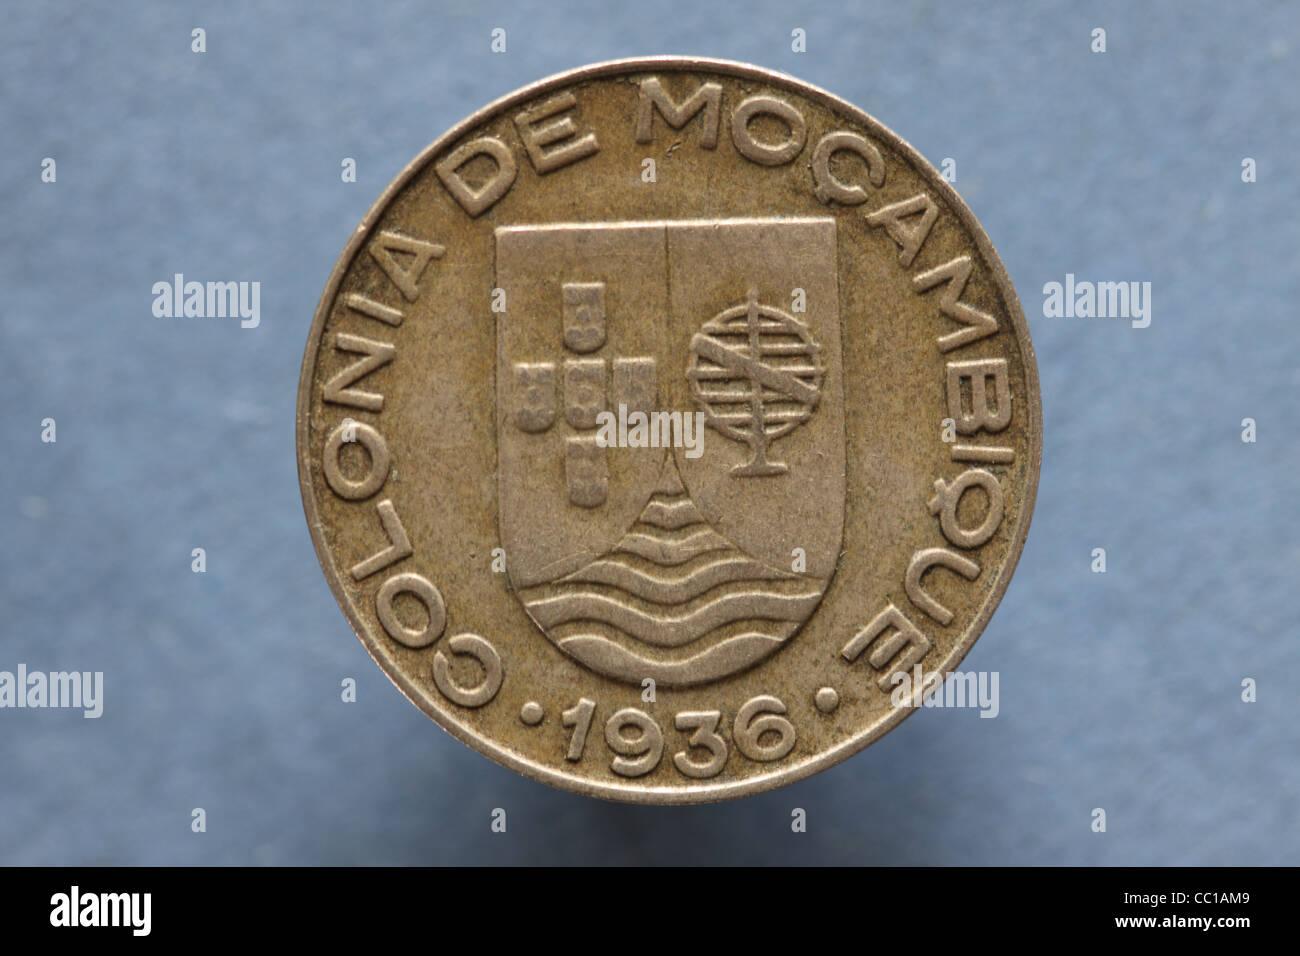 Colonia de Moçambique coin fecha 1936 un portugués colonia africana ahora Mozambique independiente Imagen De Stock